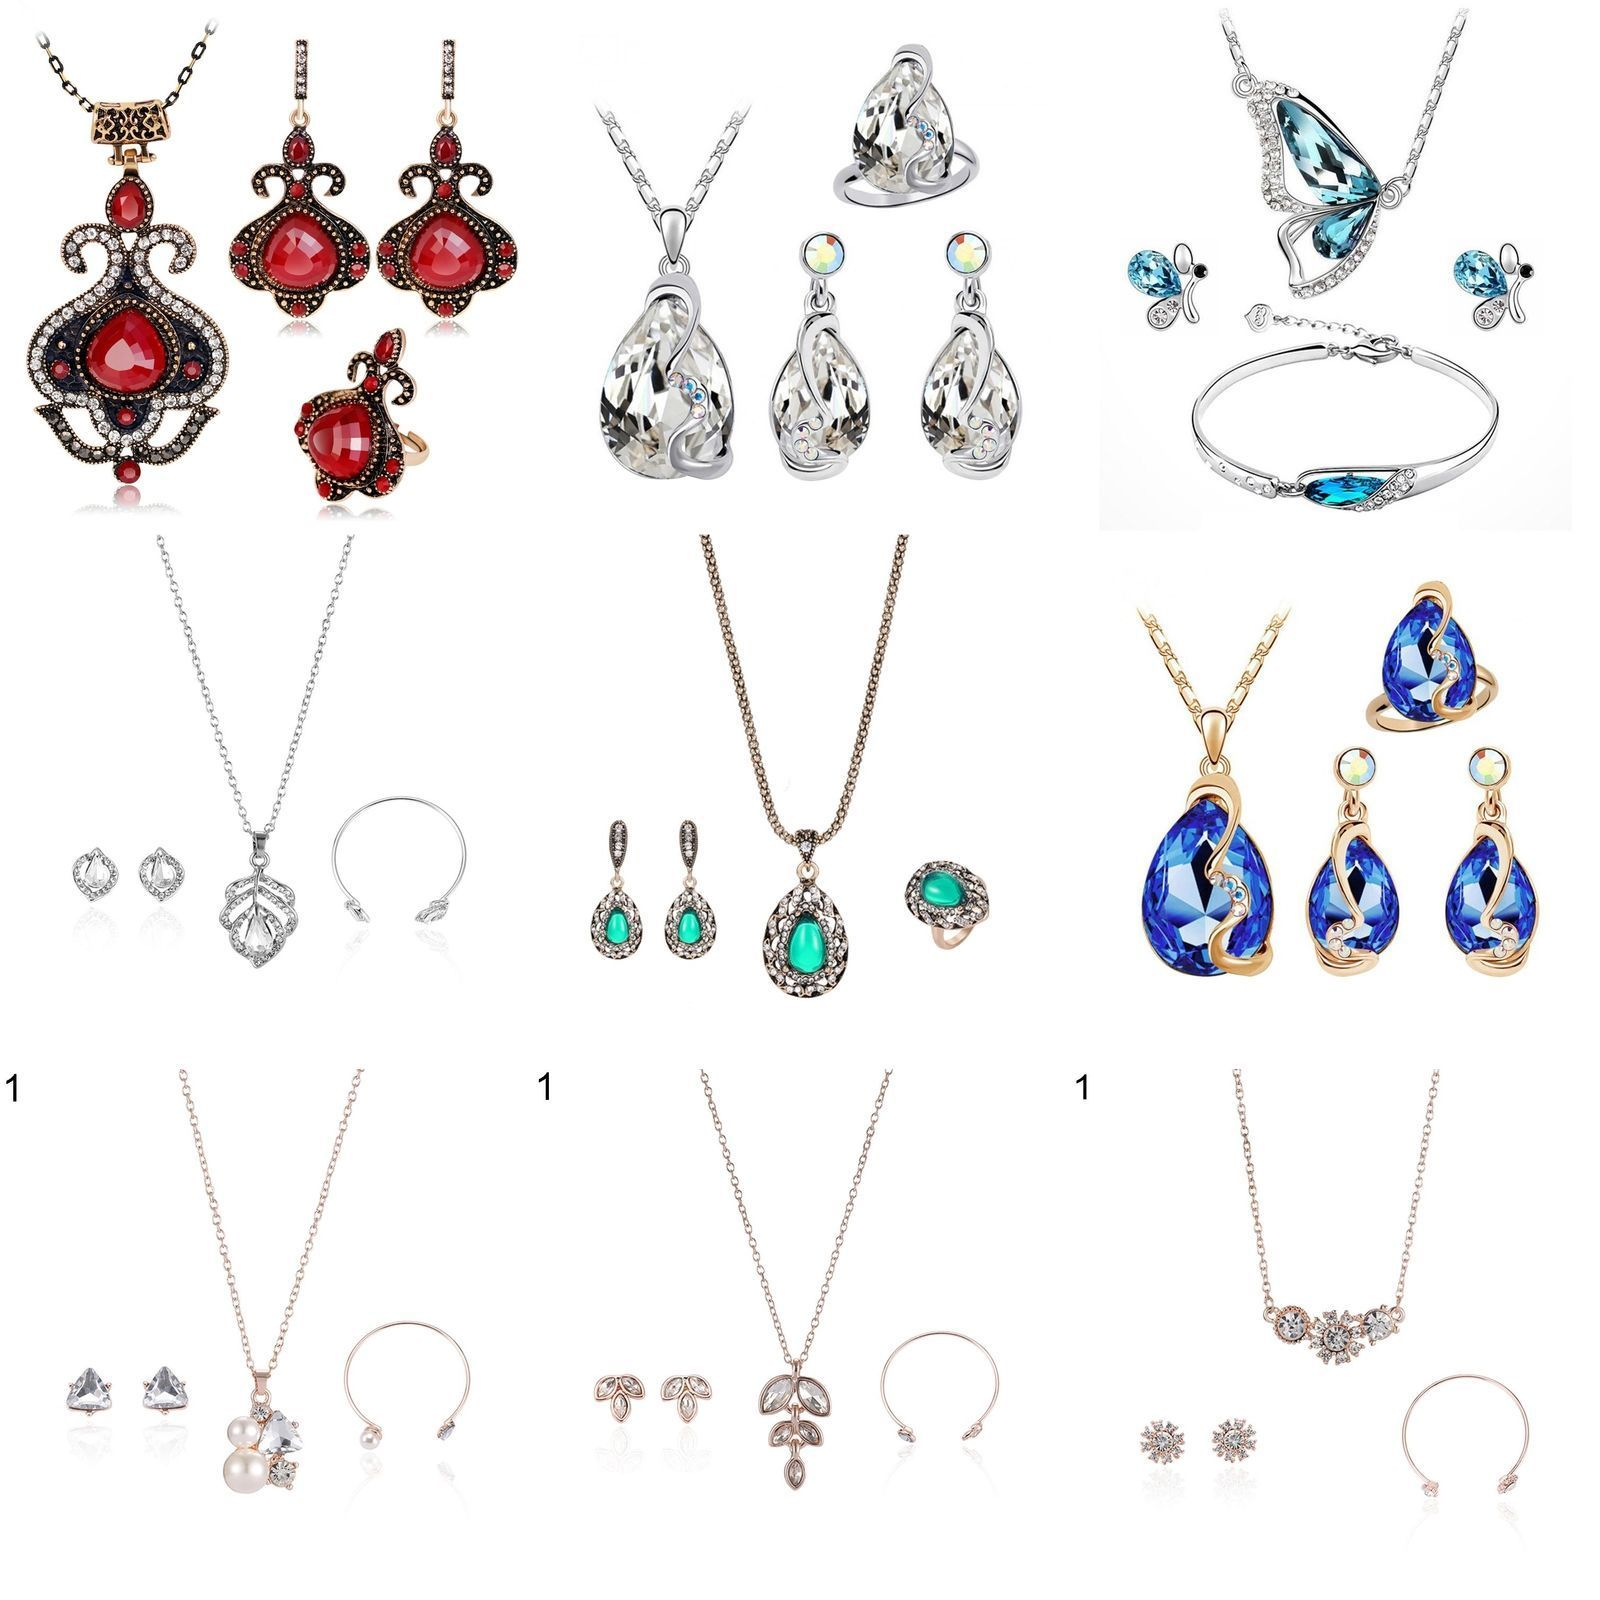 rhinestone pearl necklace earrings ring womens wedding